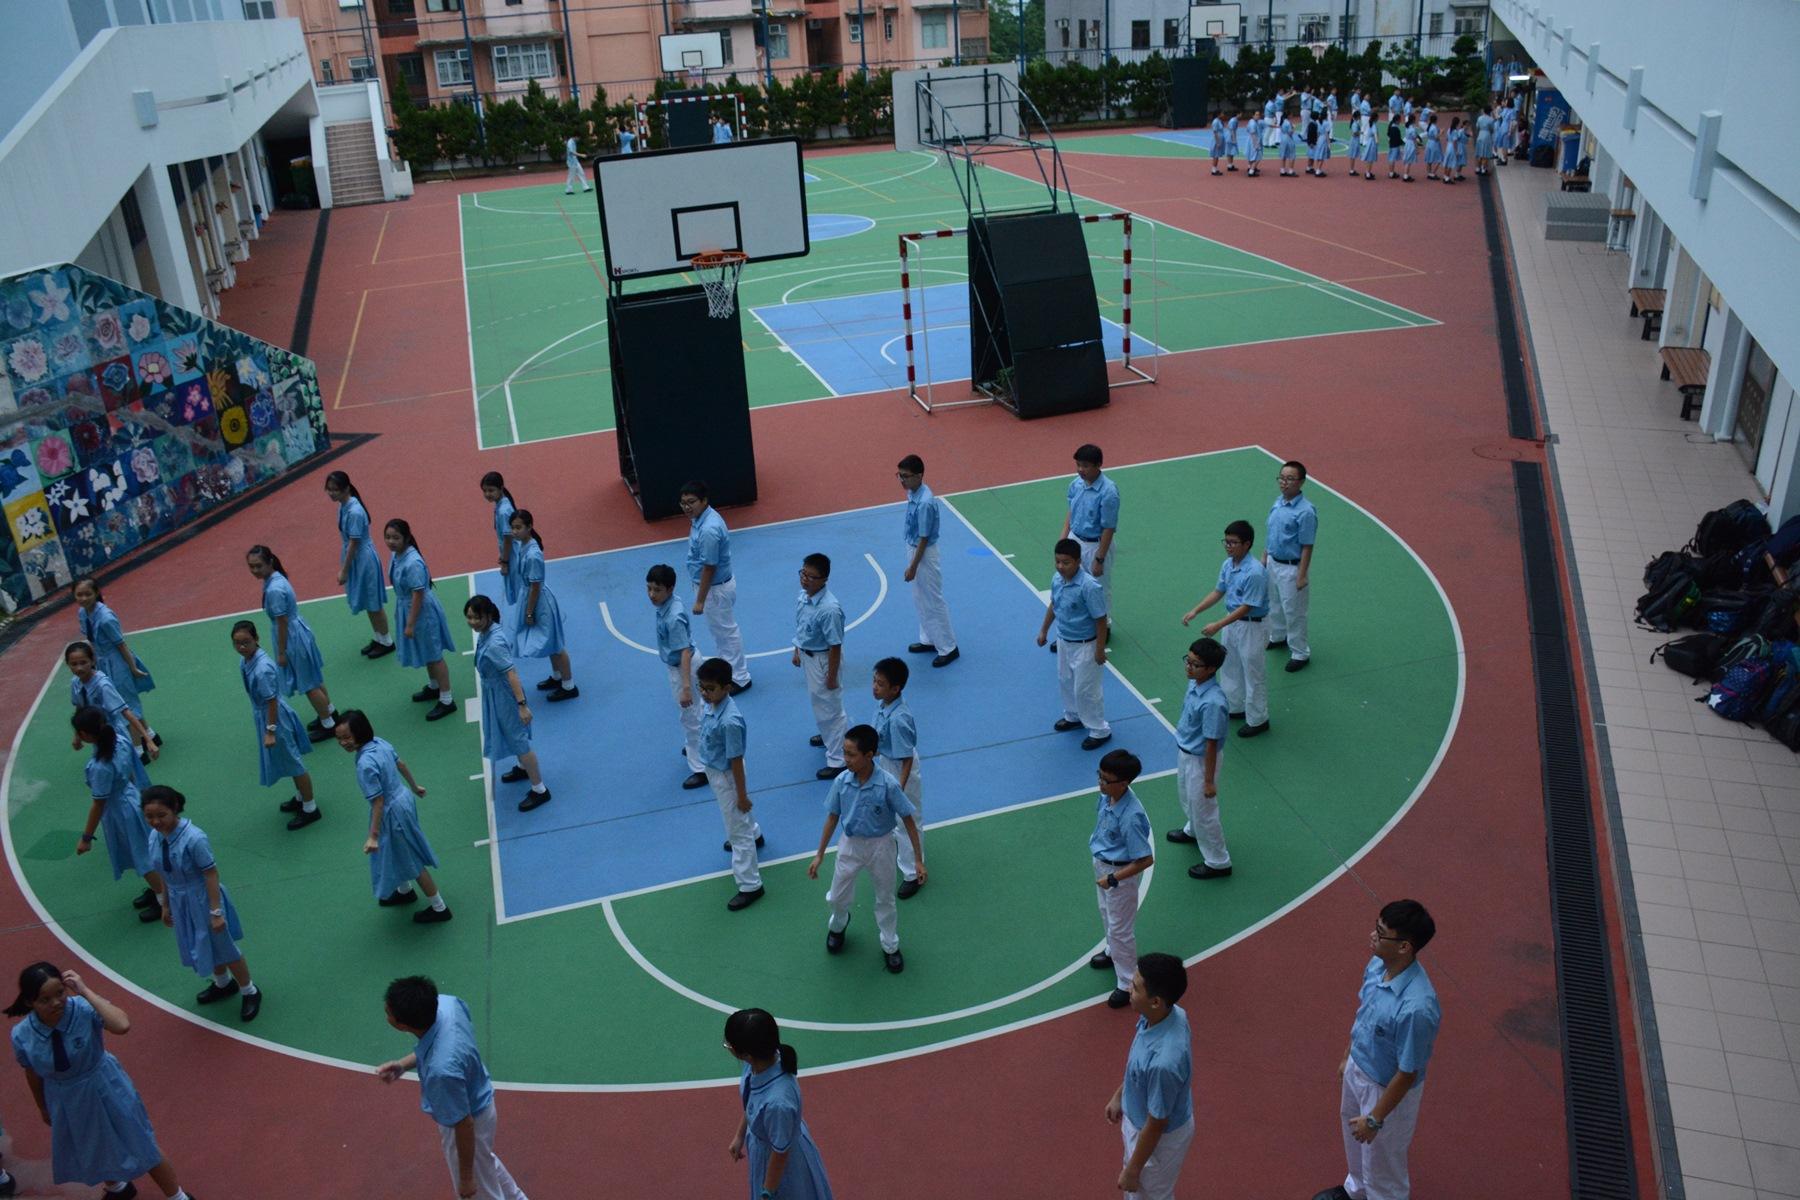 http://npc.edu.hk/sites/default/files/dsc_5517.jpg